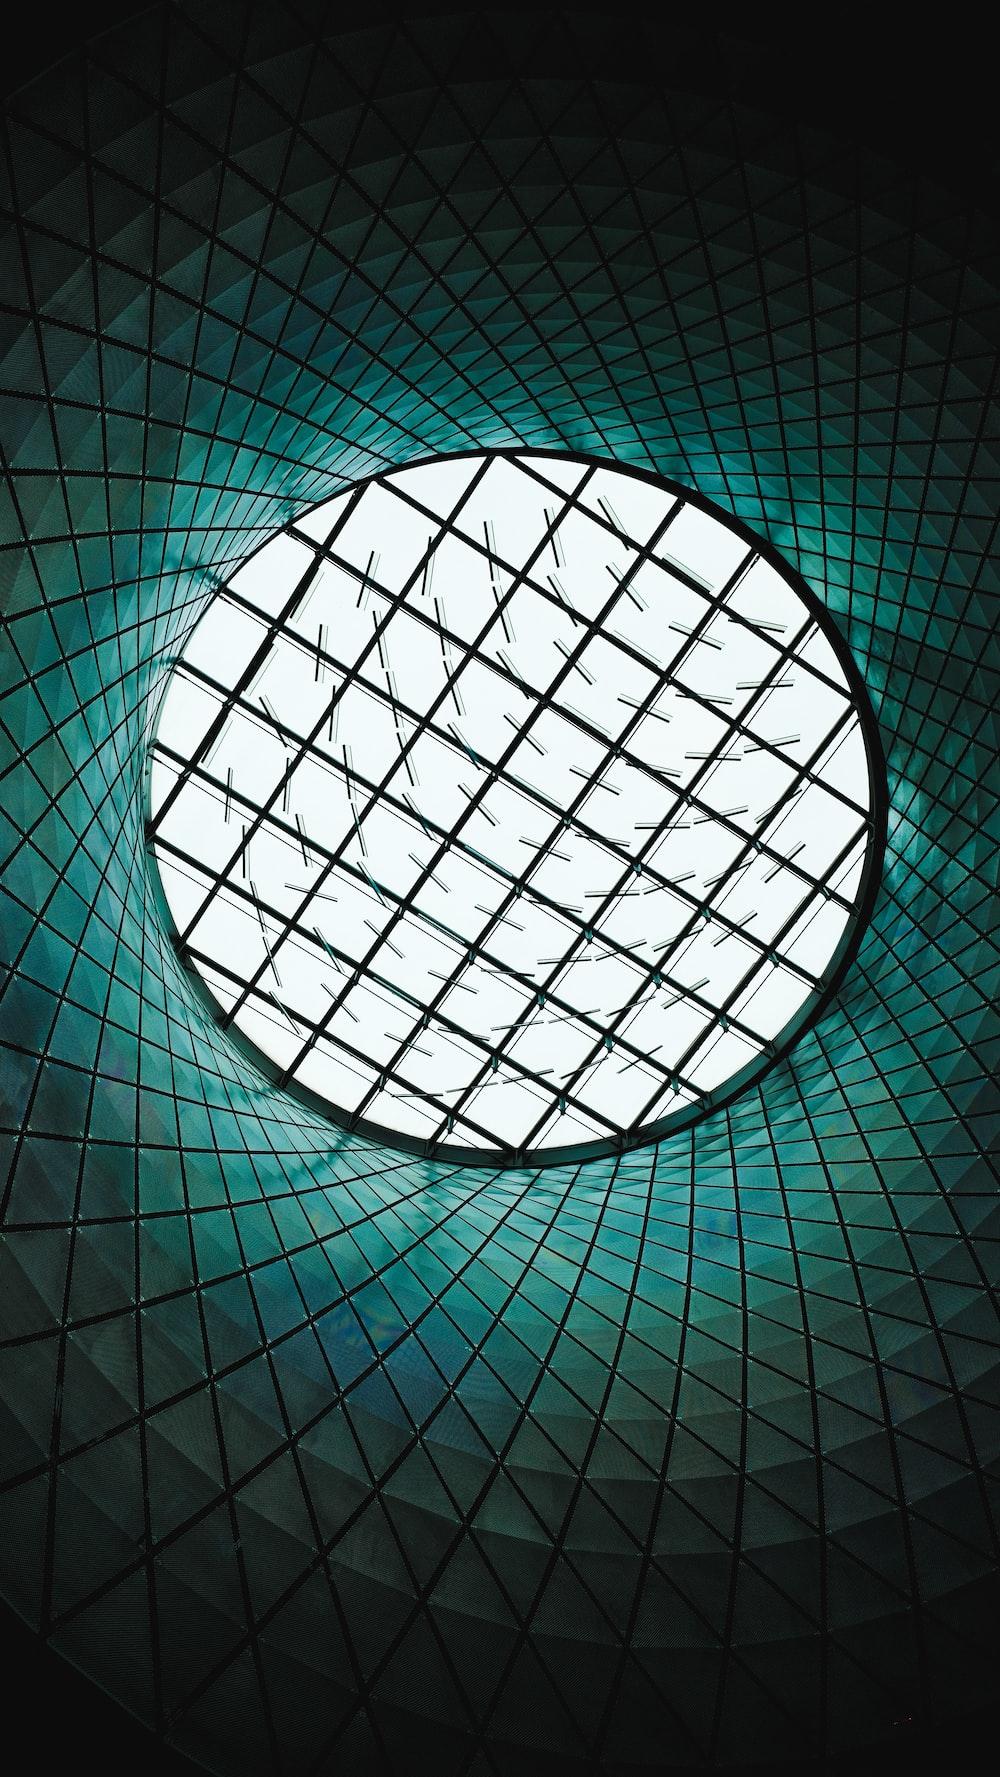 green glass building interior